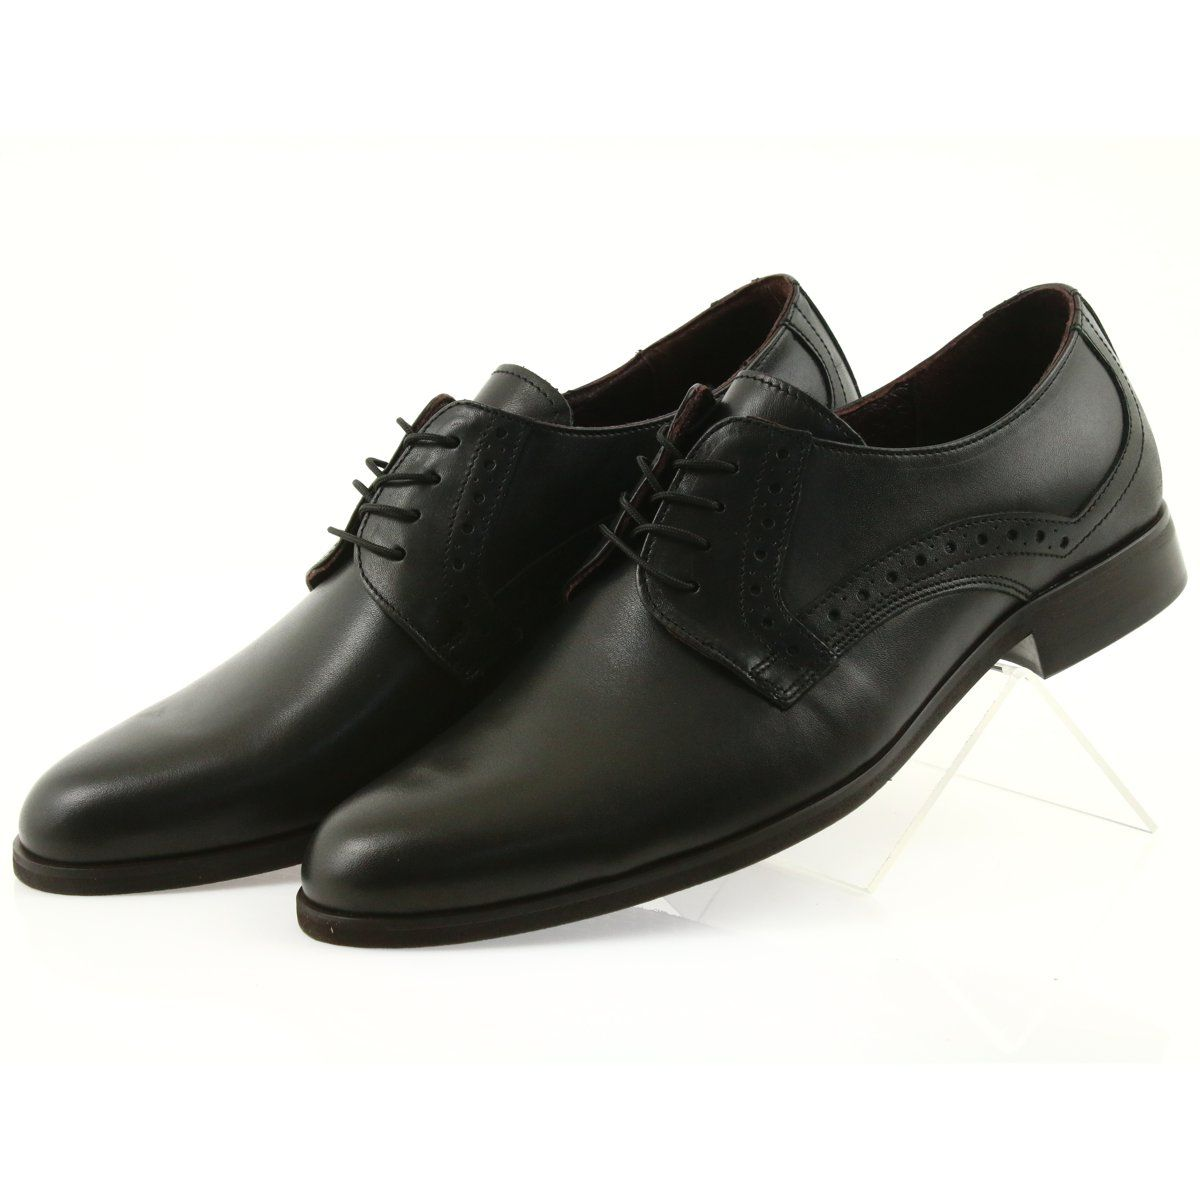 Tur Polbuty Skorzane Wiazane 388 Czarne Dress Shoes Men Shoes Shoes Mens